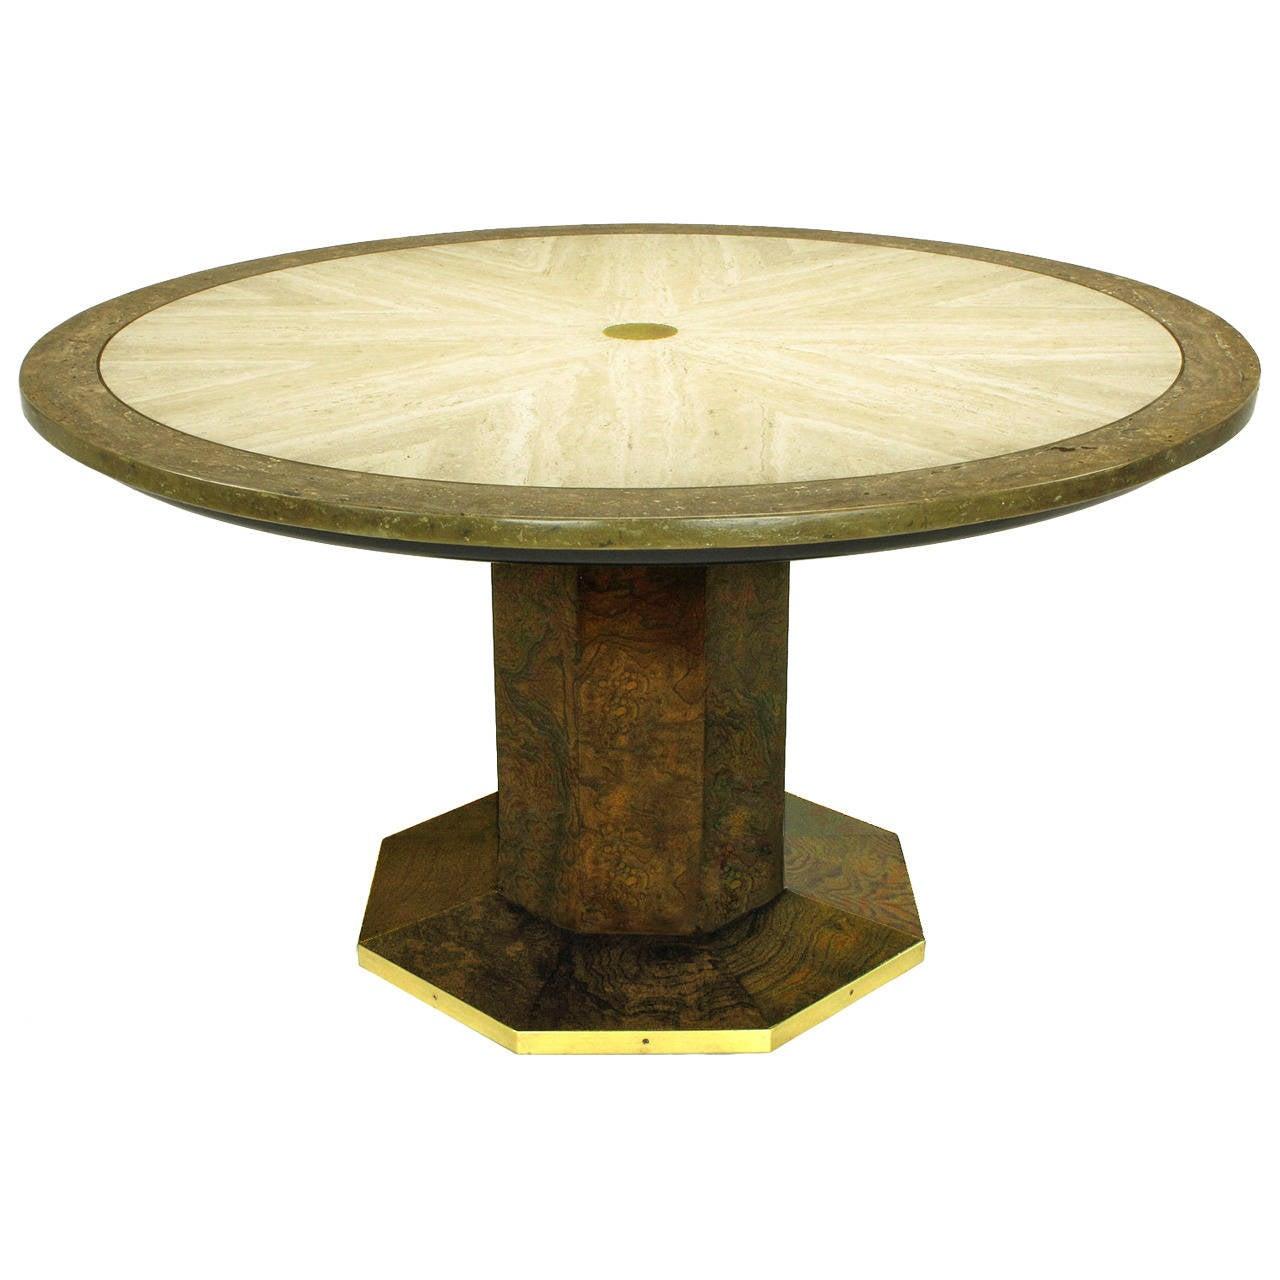 John Widdicomb Burl Walnut and Sunburst Travertine Game Table with Brass Inlay